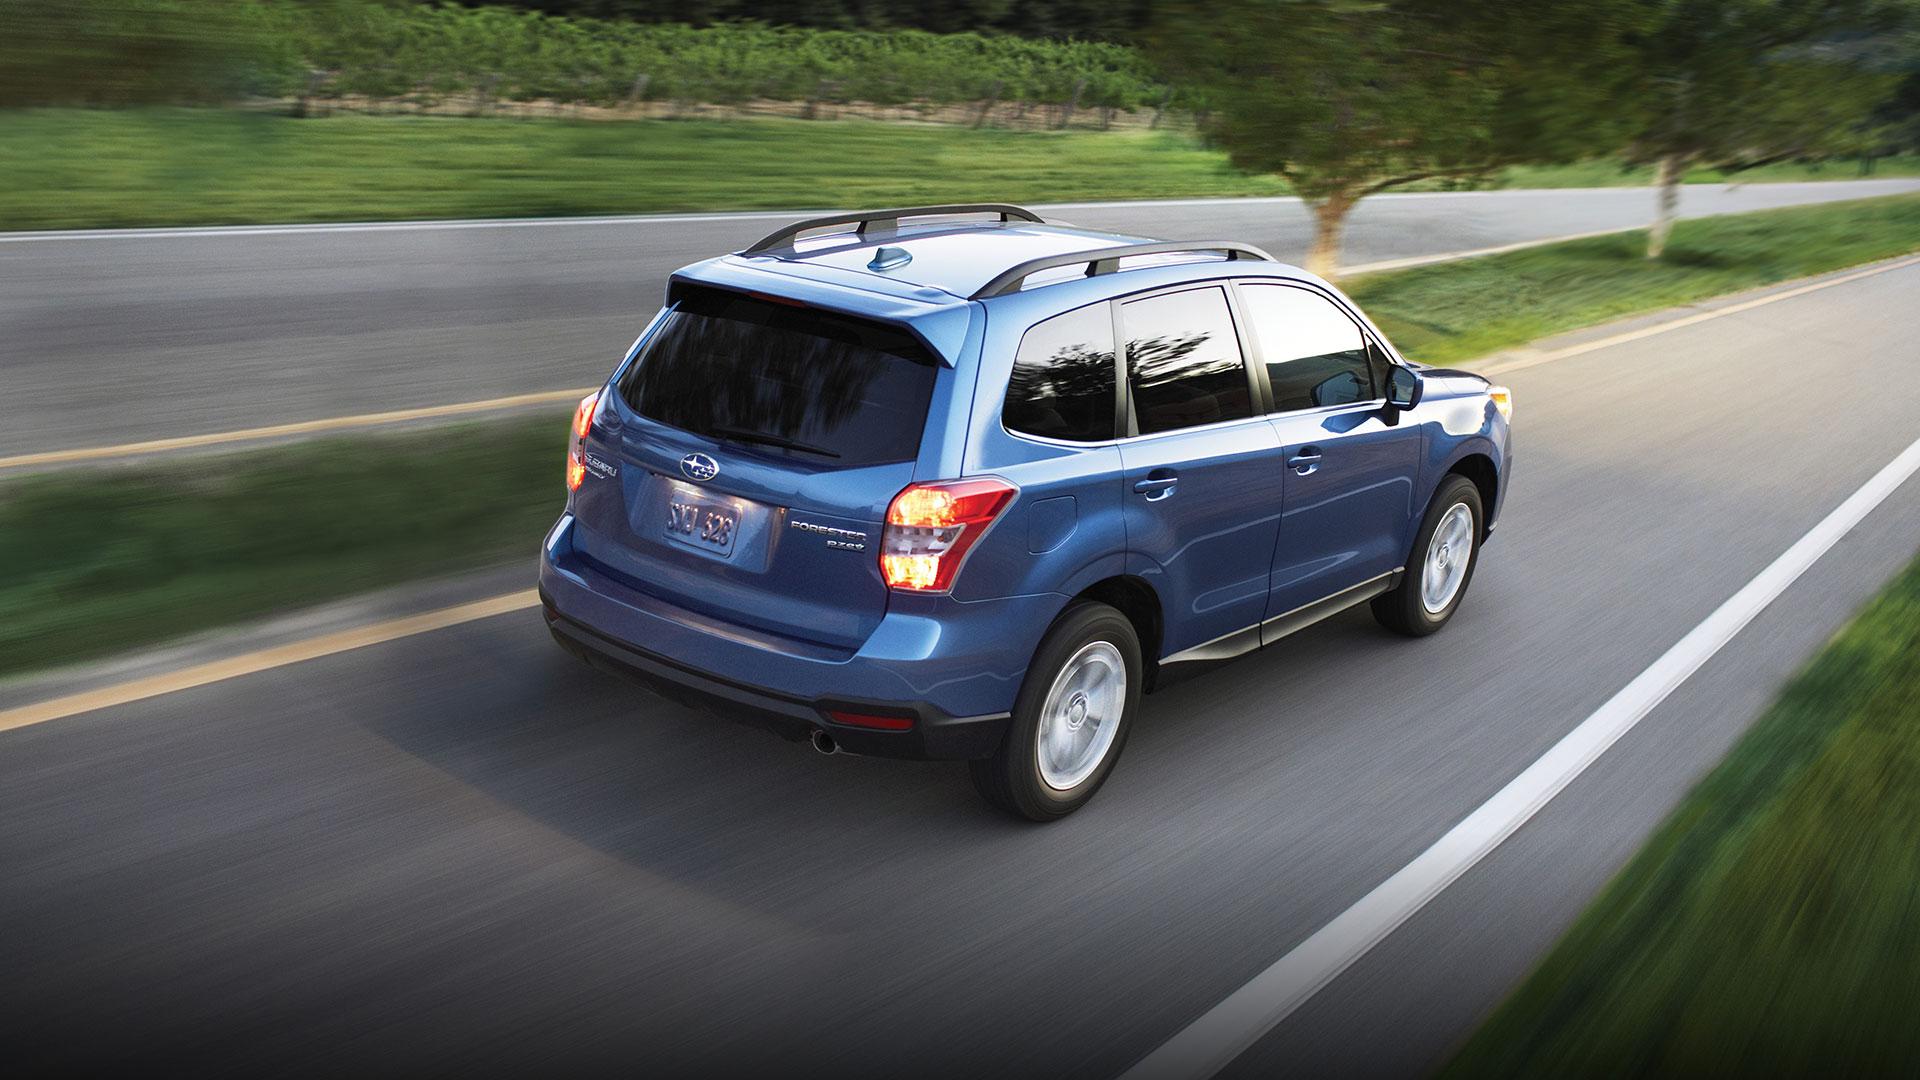 Subaru Forester 2016 >> 2016 Subaru Forester | Wallpaper | Green Speedy Roads